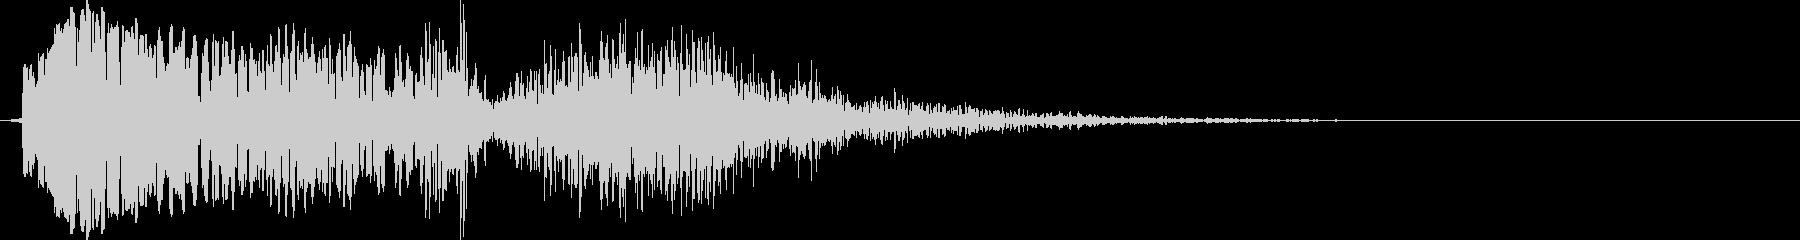 Good sound, chance sound, appearance, magic's unreproduced waveform